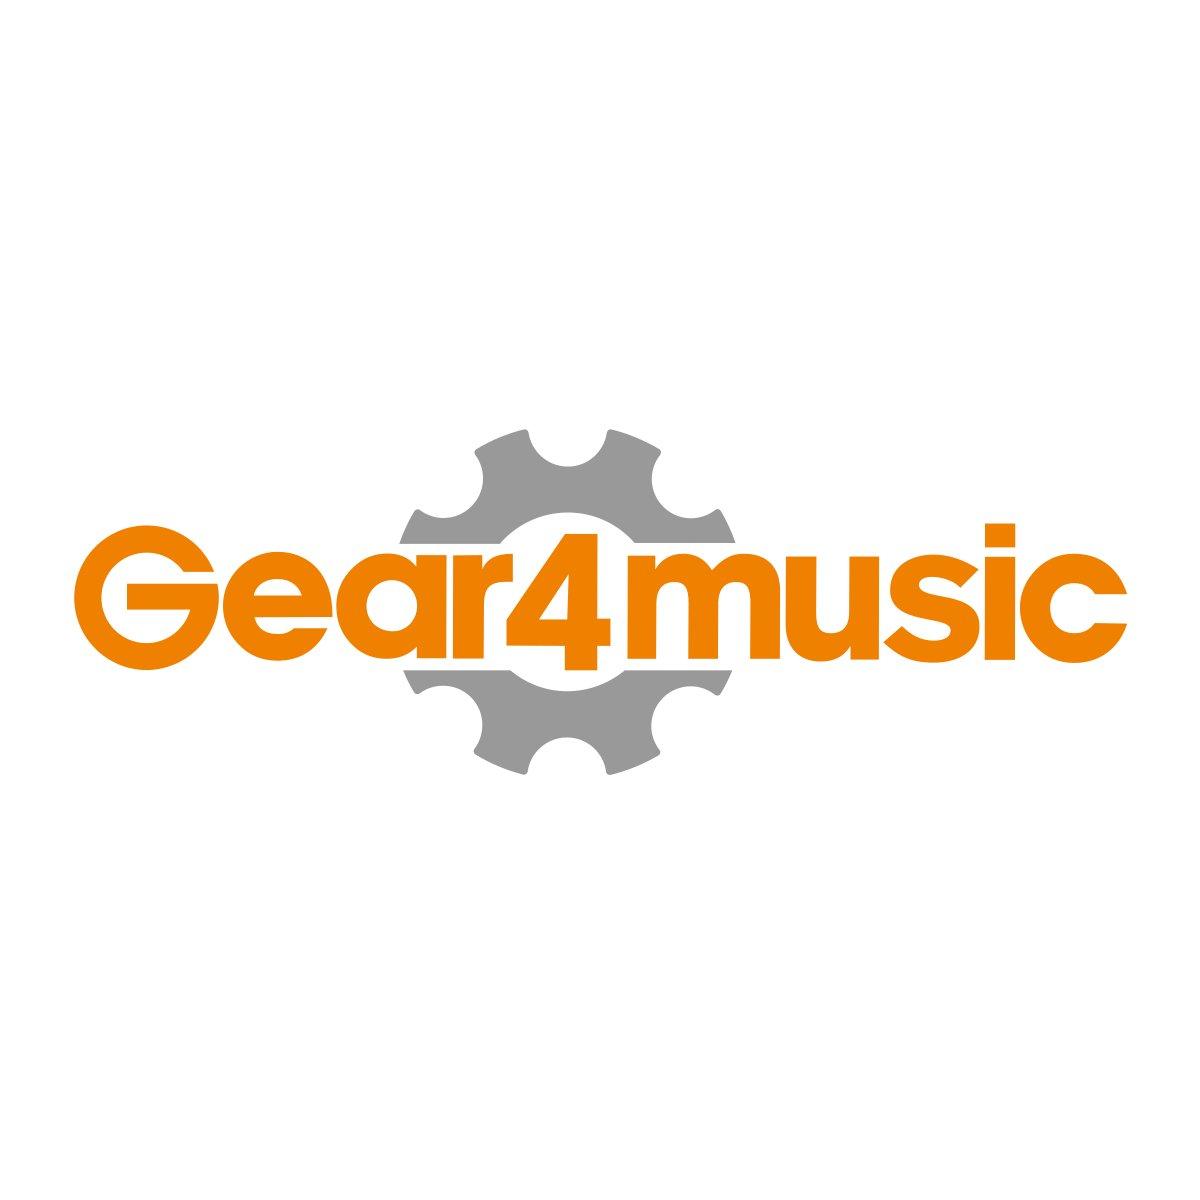 uusi korkealaatuinen yksityiskohdat paras asenne Details about New Jersey II Electric Guitar by Gear4music Cherry Red